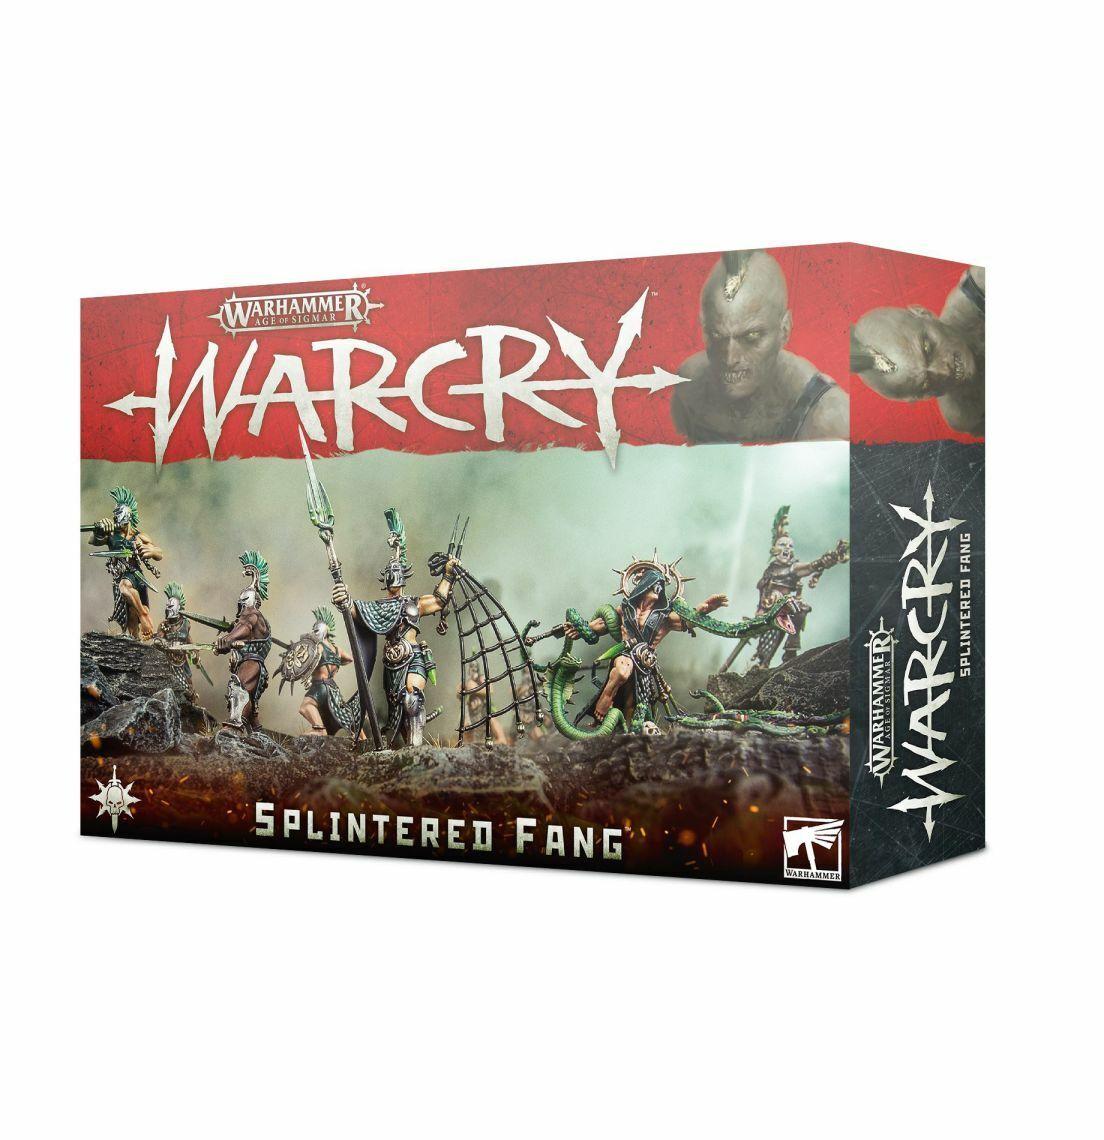 Warhammer Edad Of Sigmar  Warcry The Splinterouge Fang Games Workshop Kriegerschar  être en grande demande